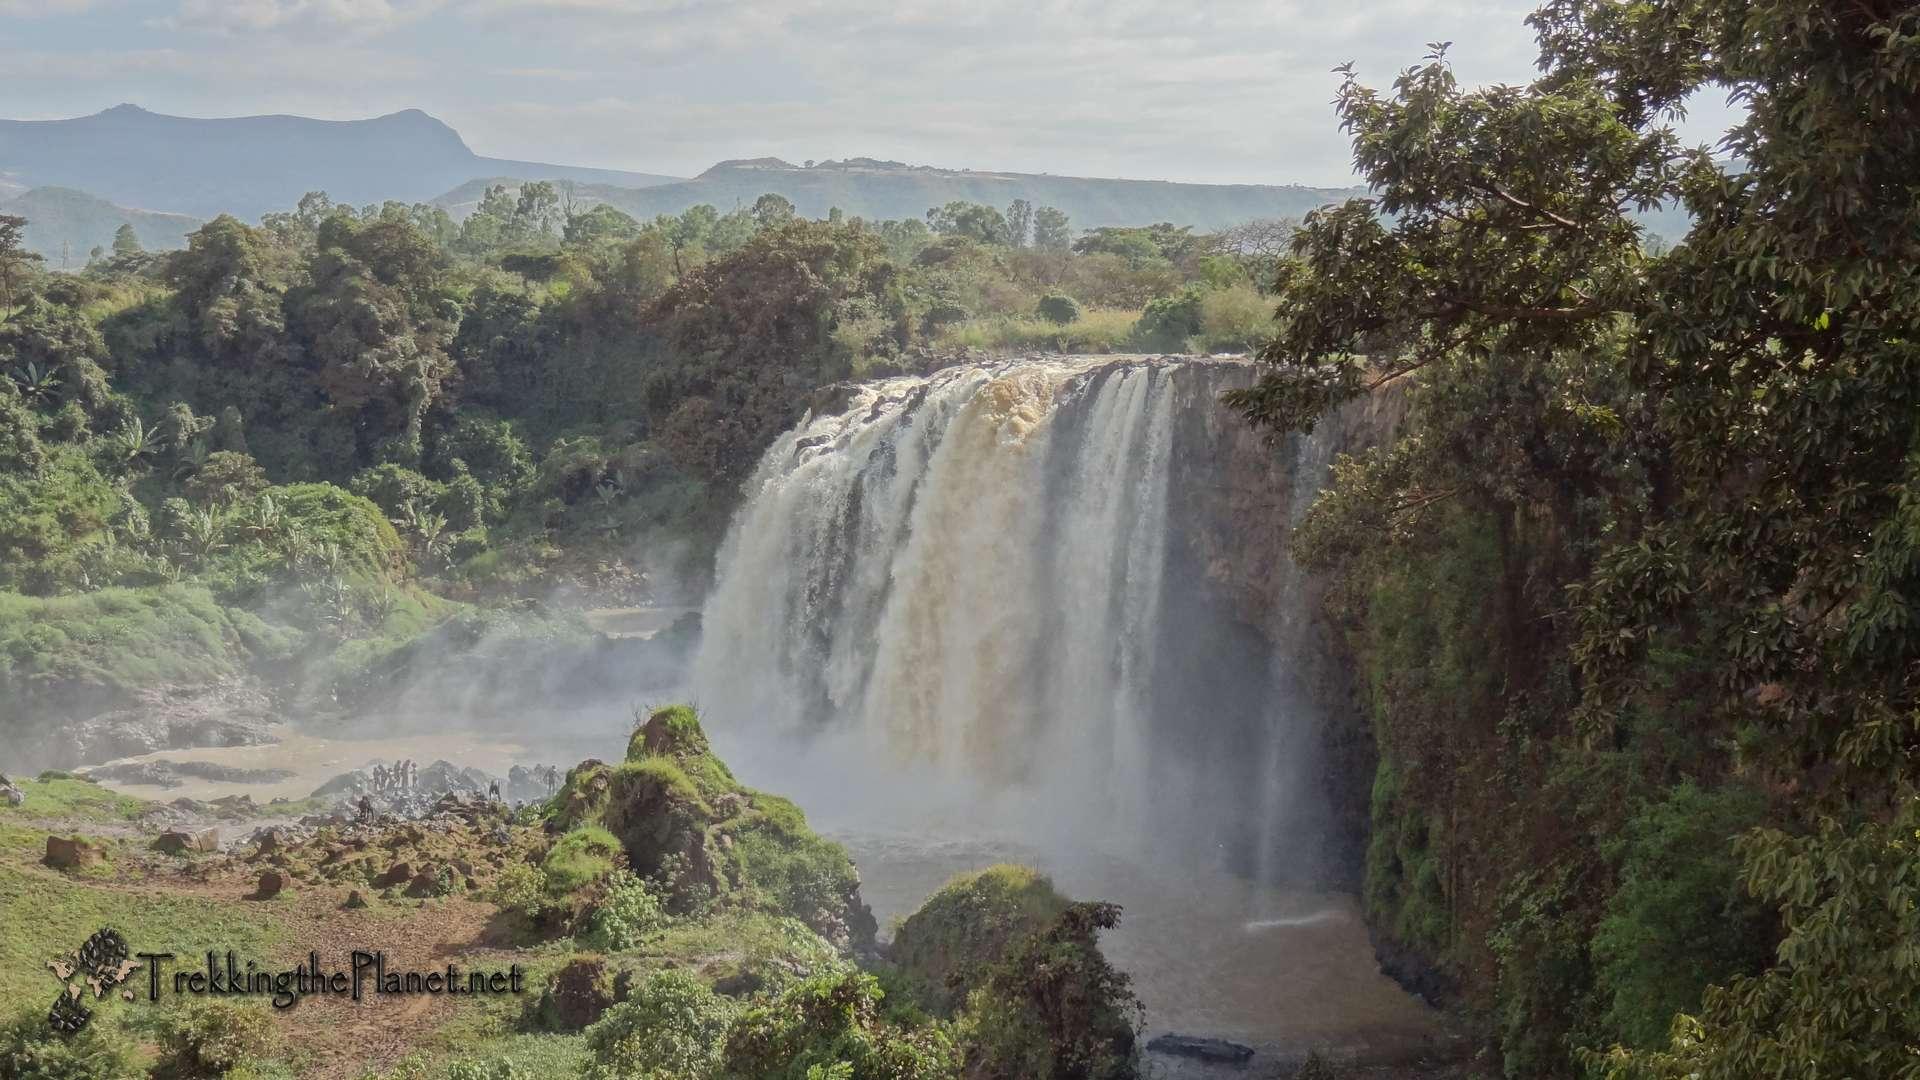 Blue Nile Falls Wallpaper Trekking The Planet Wallpaper Series 8 Trekking The Planet